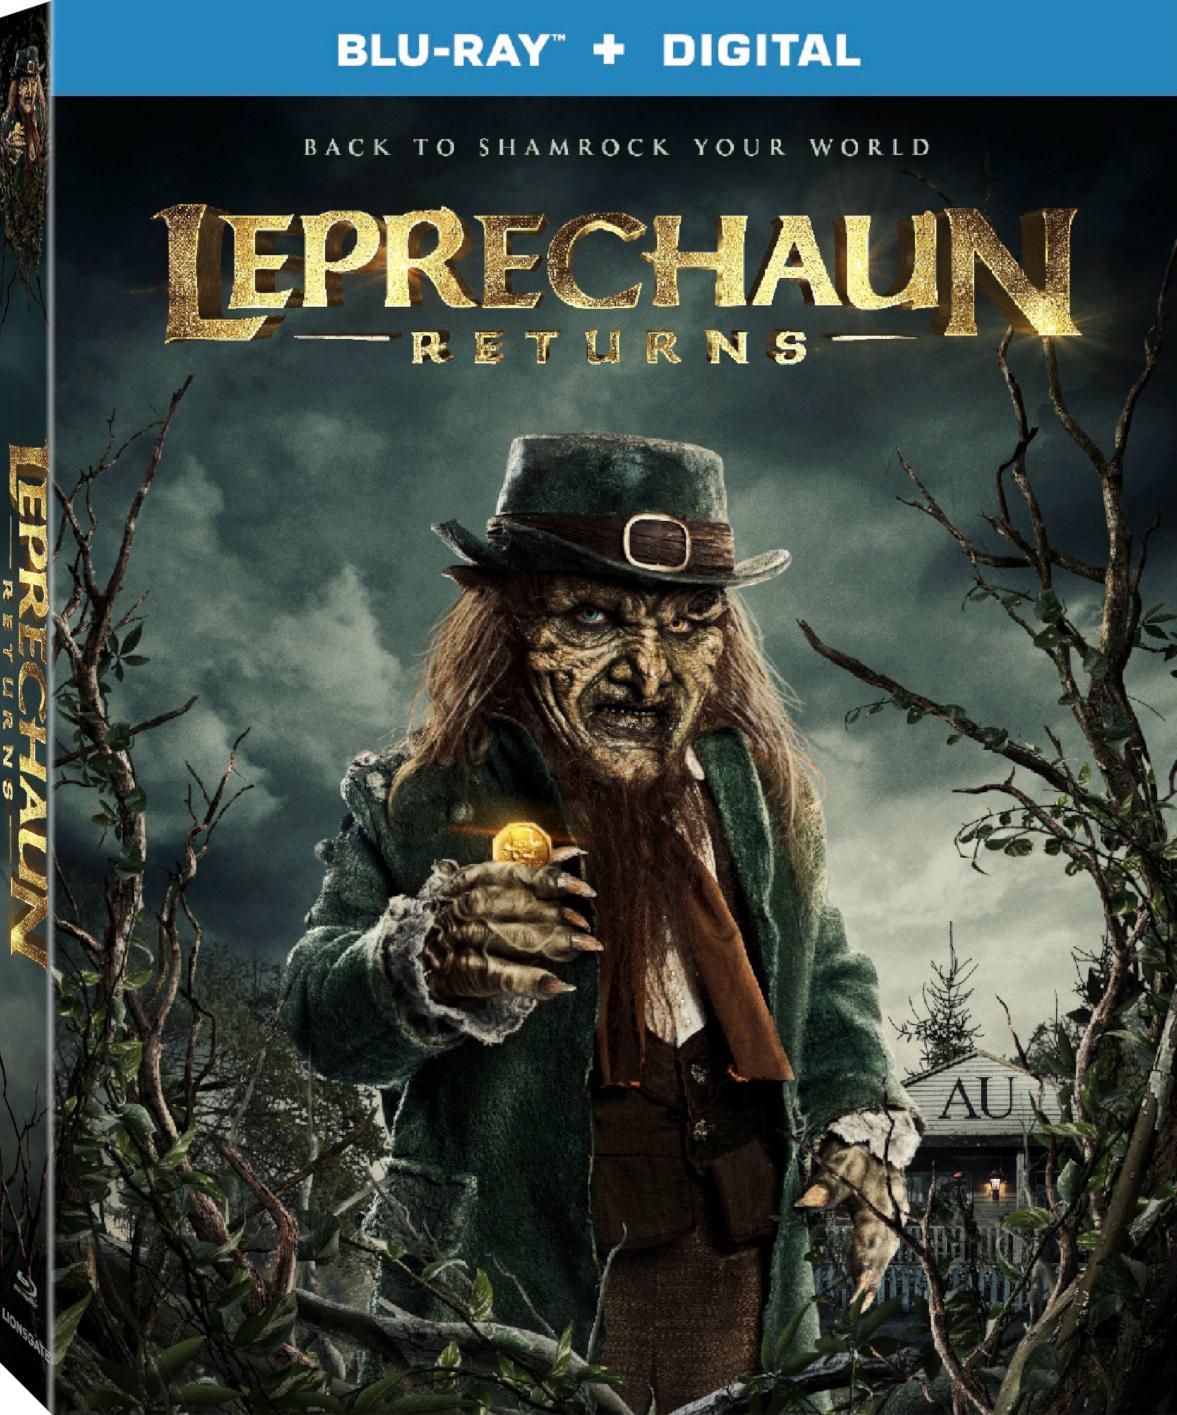 Leprechaun Returns (Blu-ray)(Region A)(Pre-order / Jun 11)